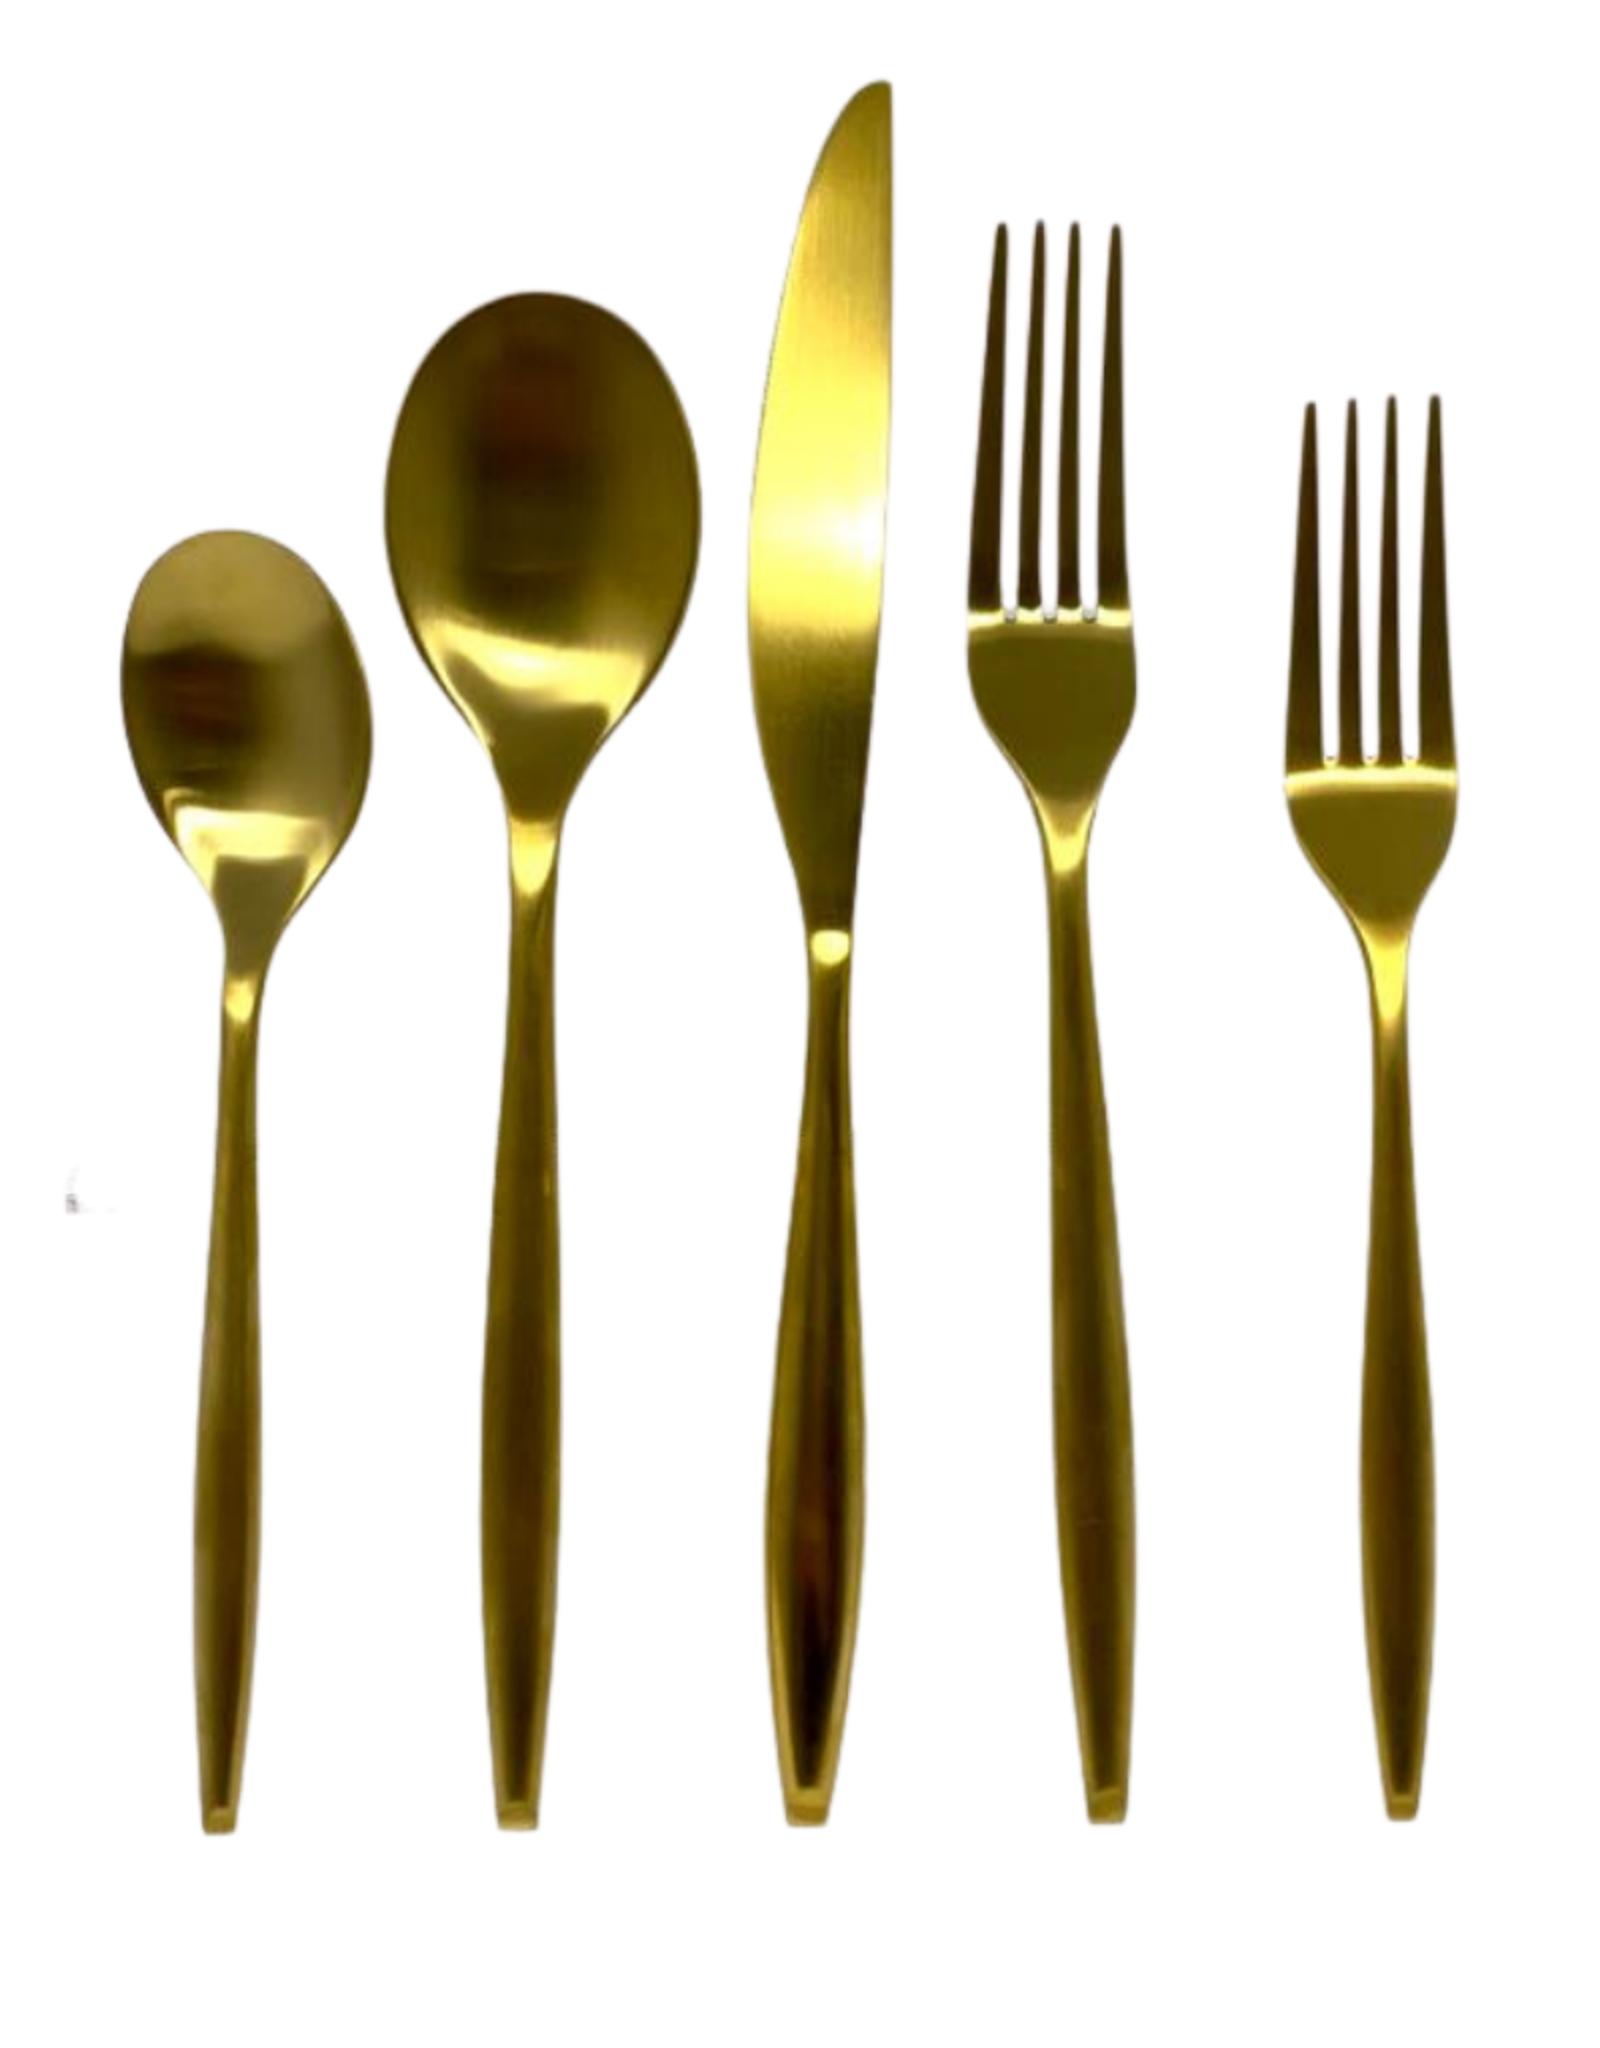 Milano Matte Gold 20 Piece Flatware Set